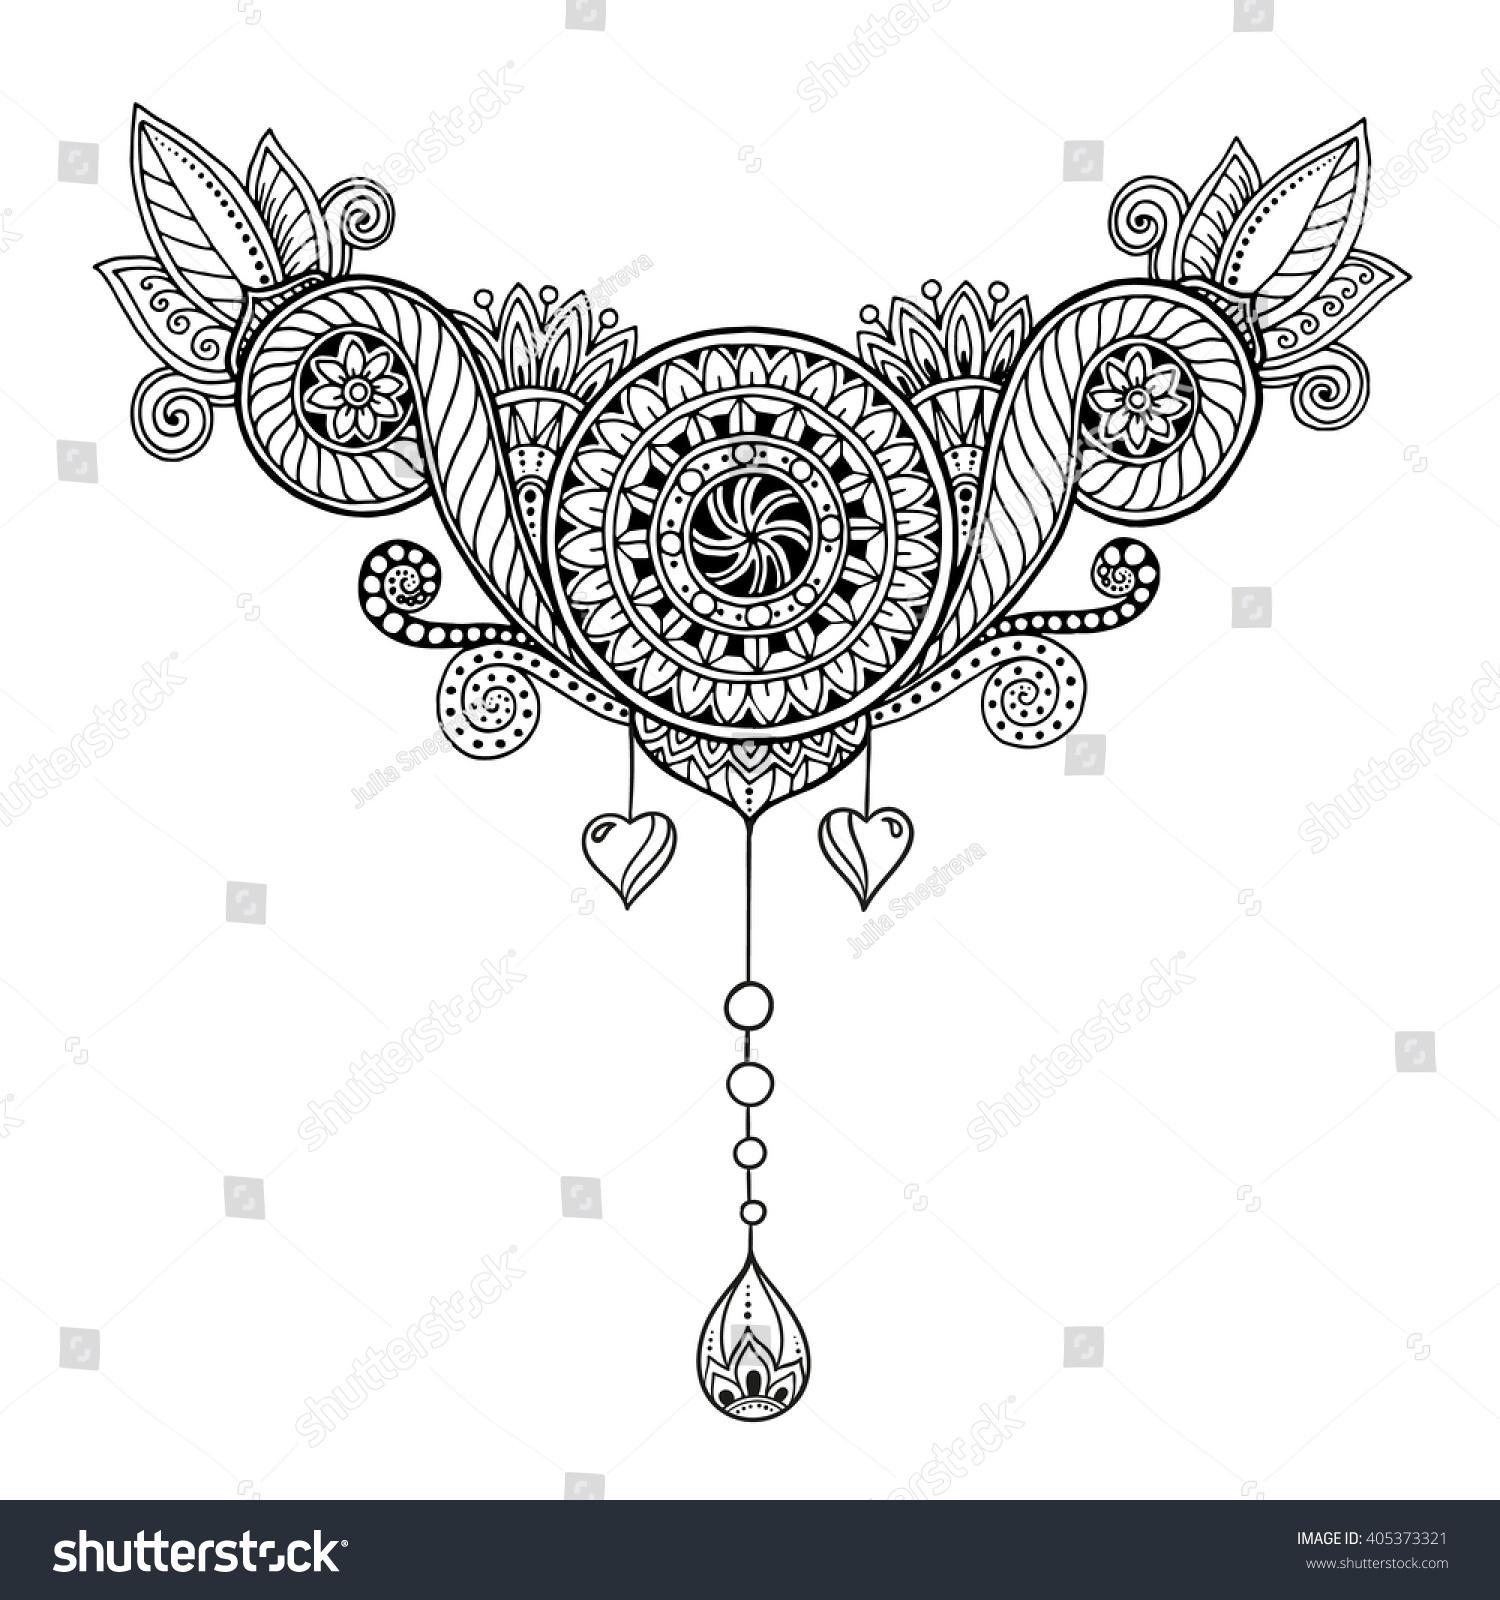 Mehndi Zentangle : Ethnic floral zentangle doodle background pattern in